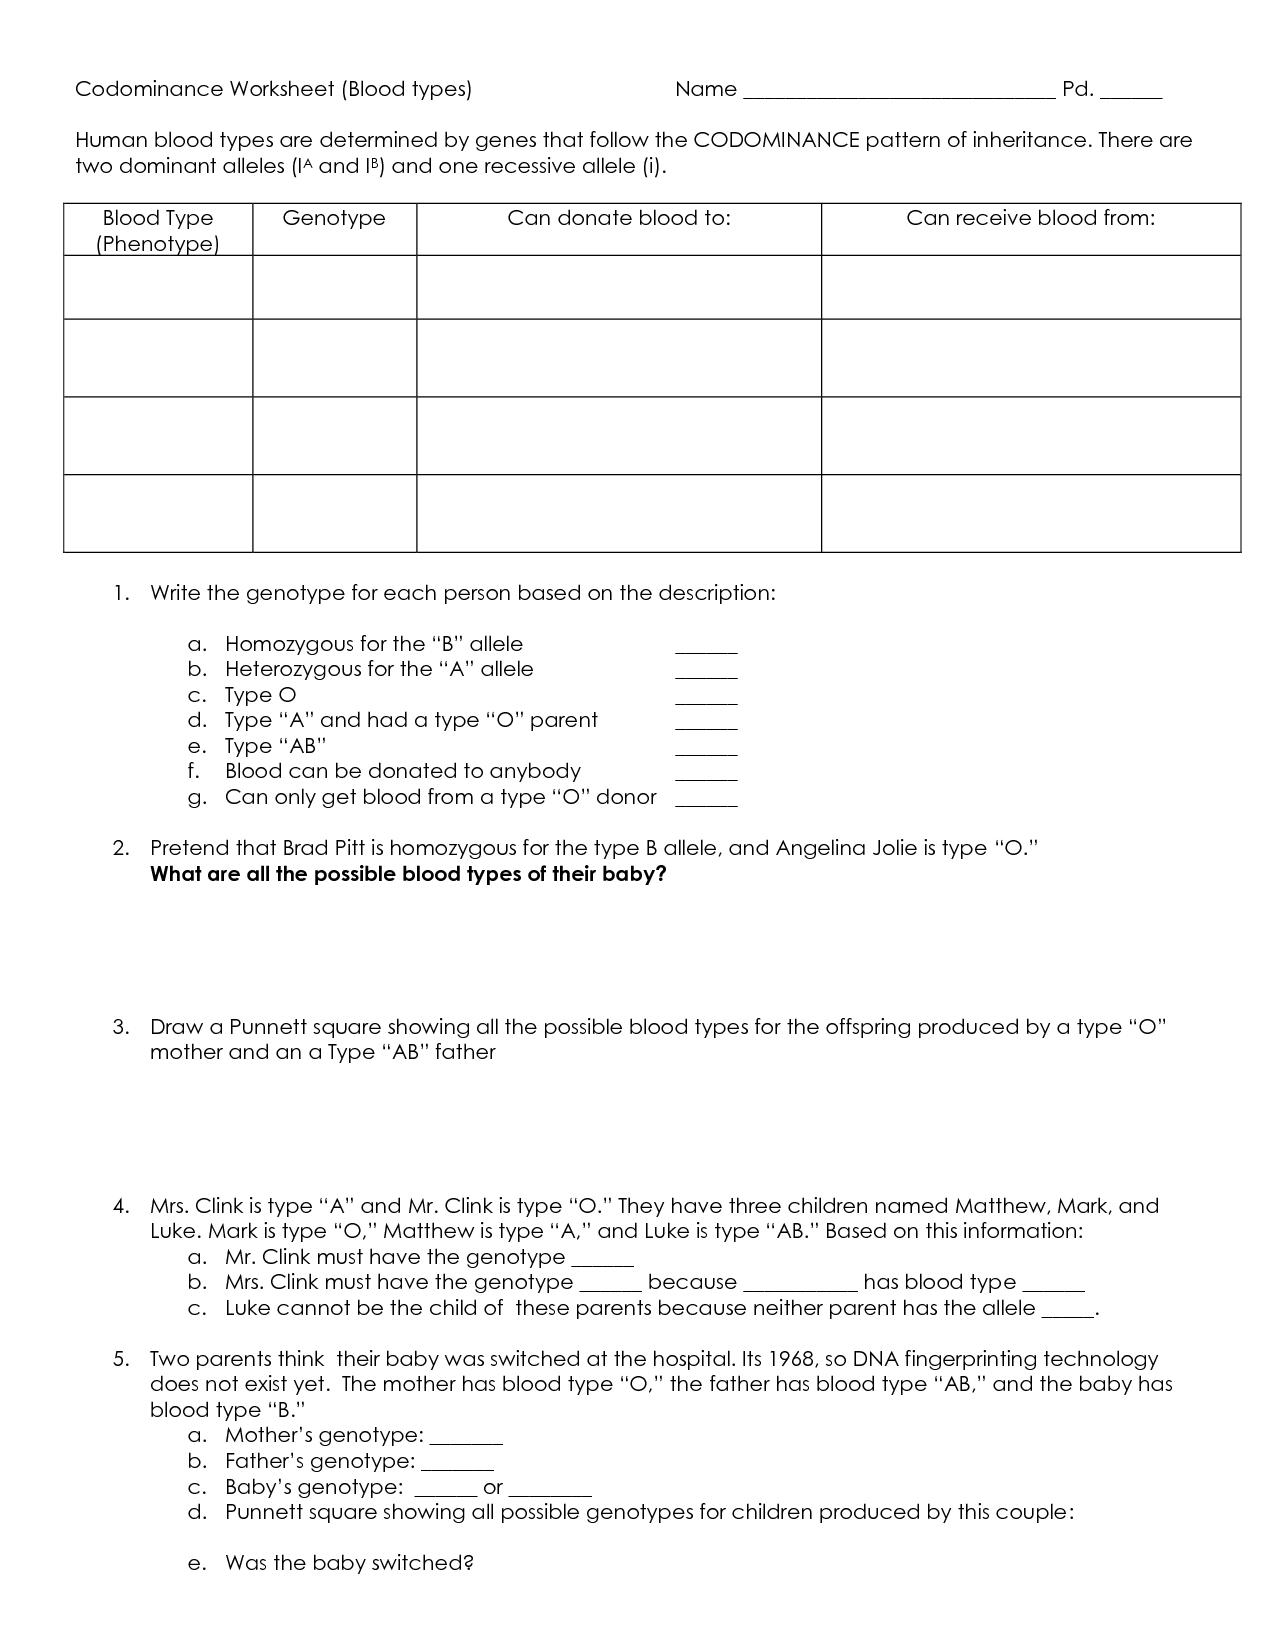 Biochemistry Worksheet With Answers